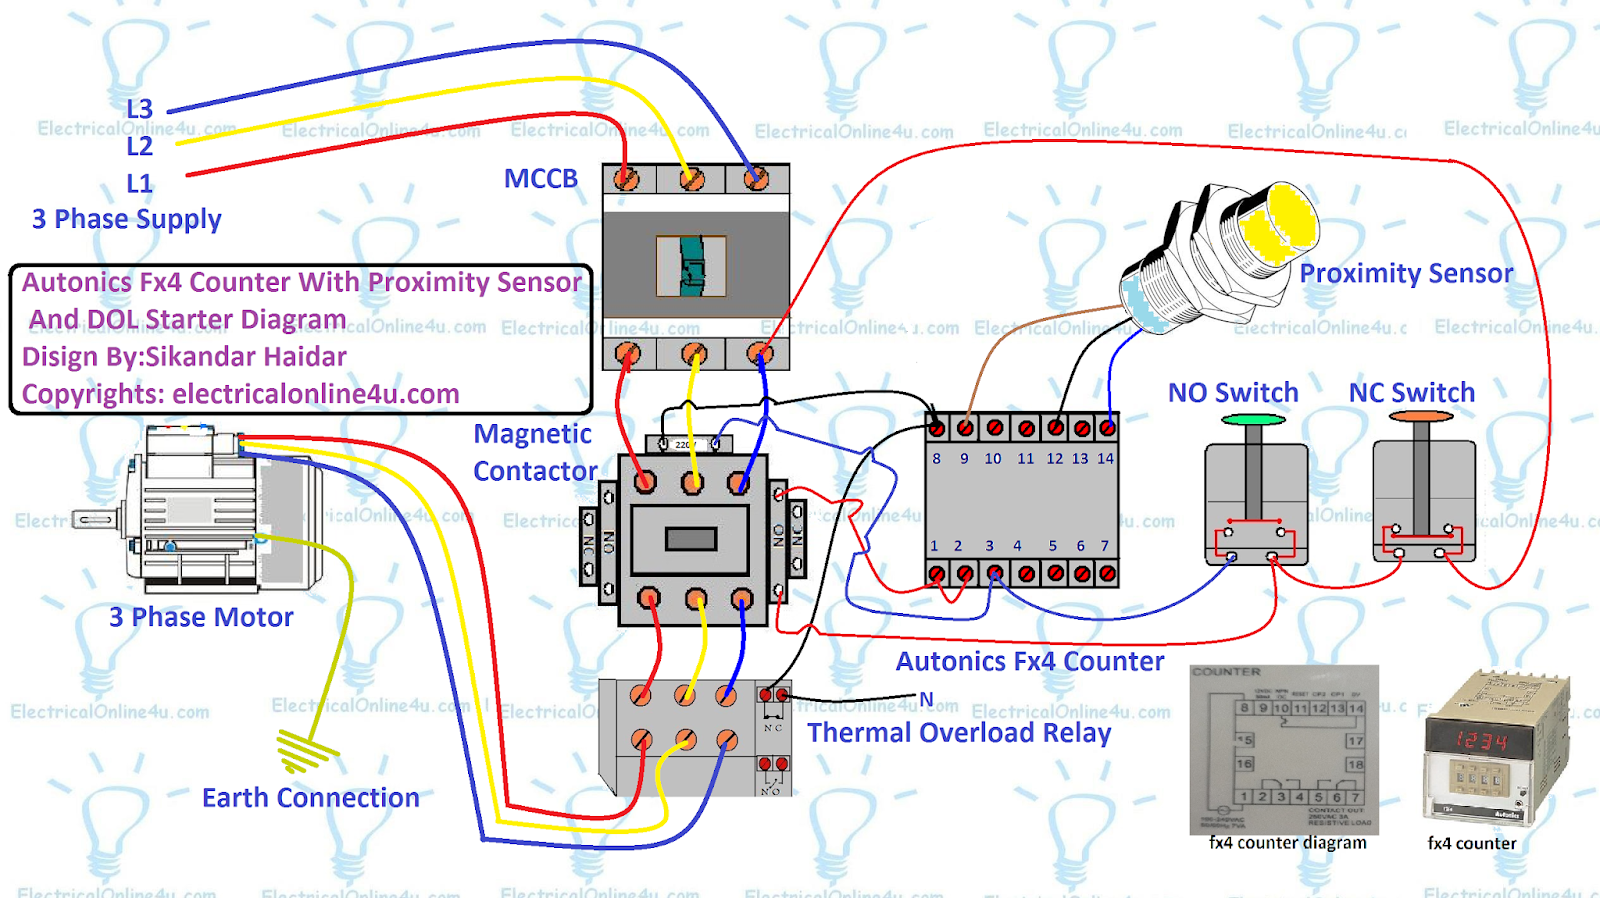 autonics fx4 counter with dol starter and proximity sensor diagram [ 1600 x 898 Pixel ]